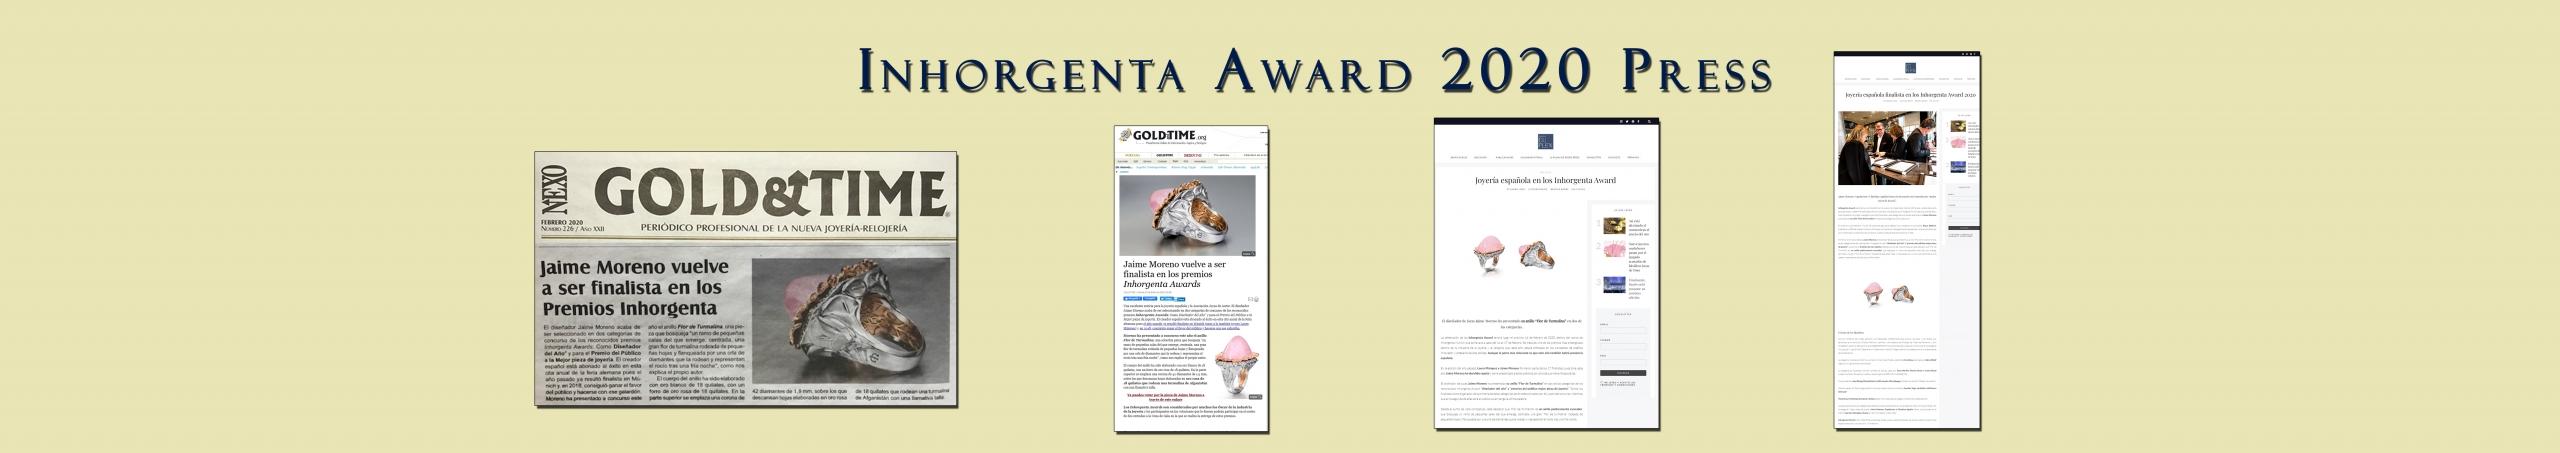 2020 Press Jaime Moreno - Best Spanish Fine Jewelry Designer